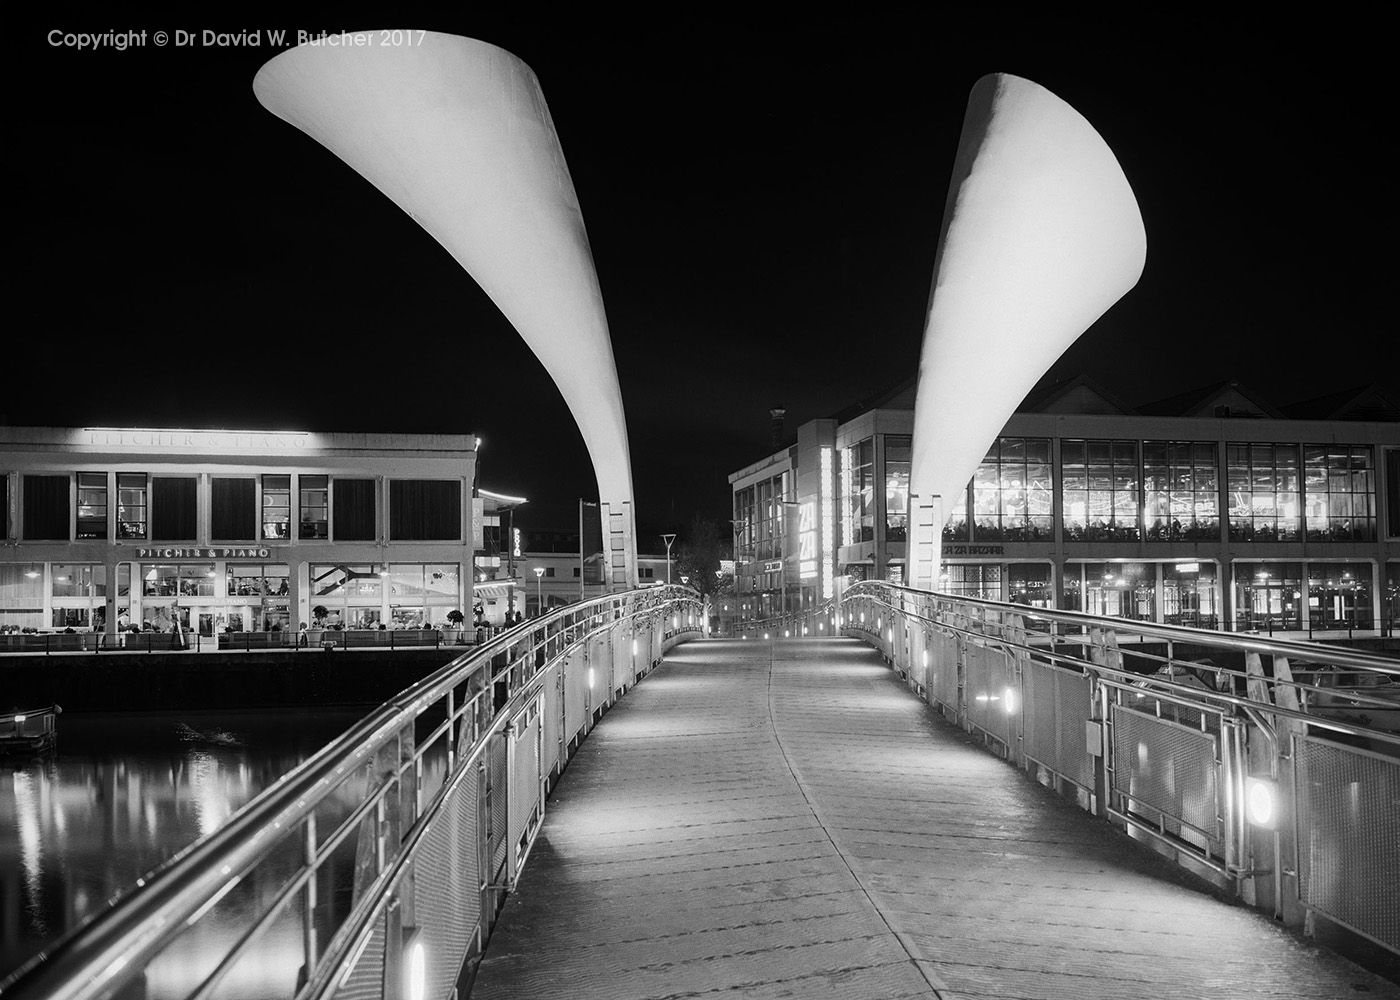 Briston Harbour Pero's Bridge at Night, England